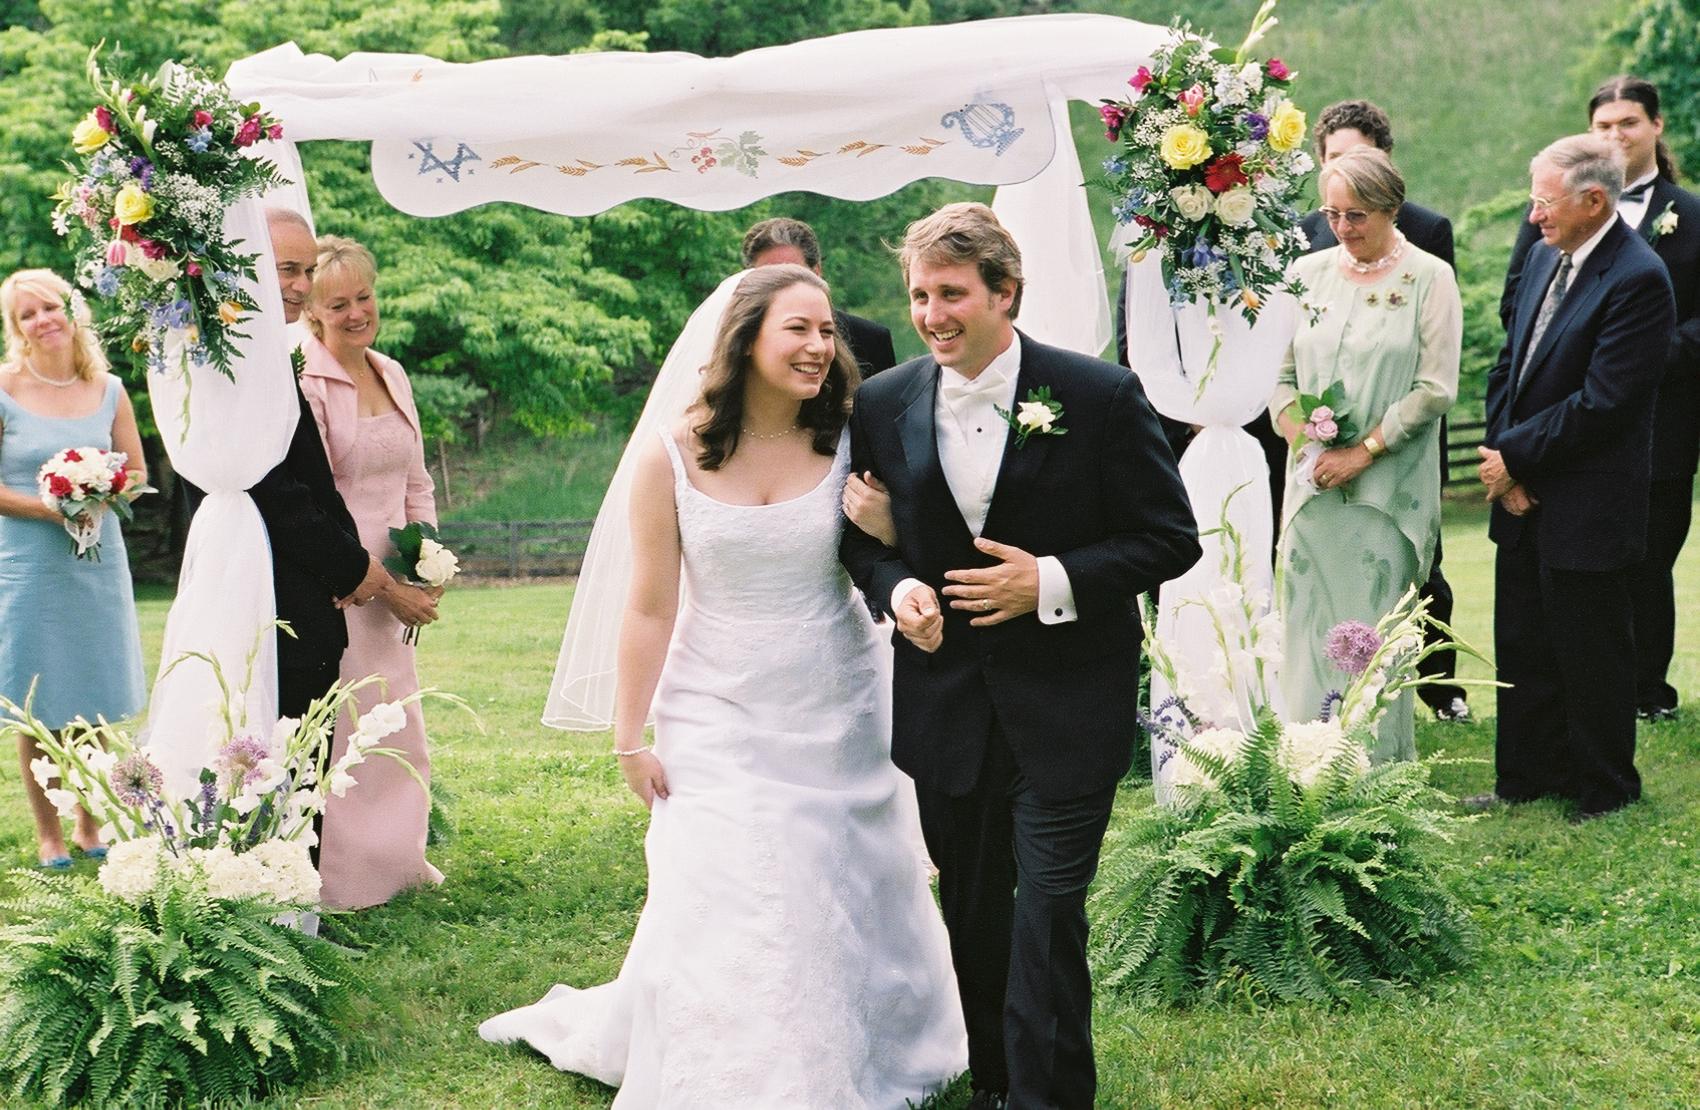 bride and groom outdoors walking